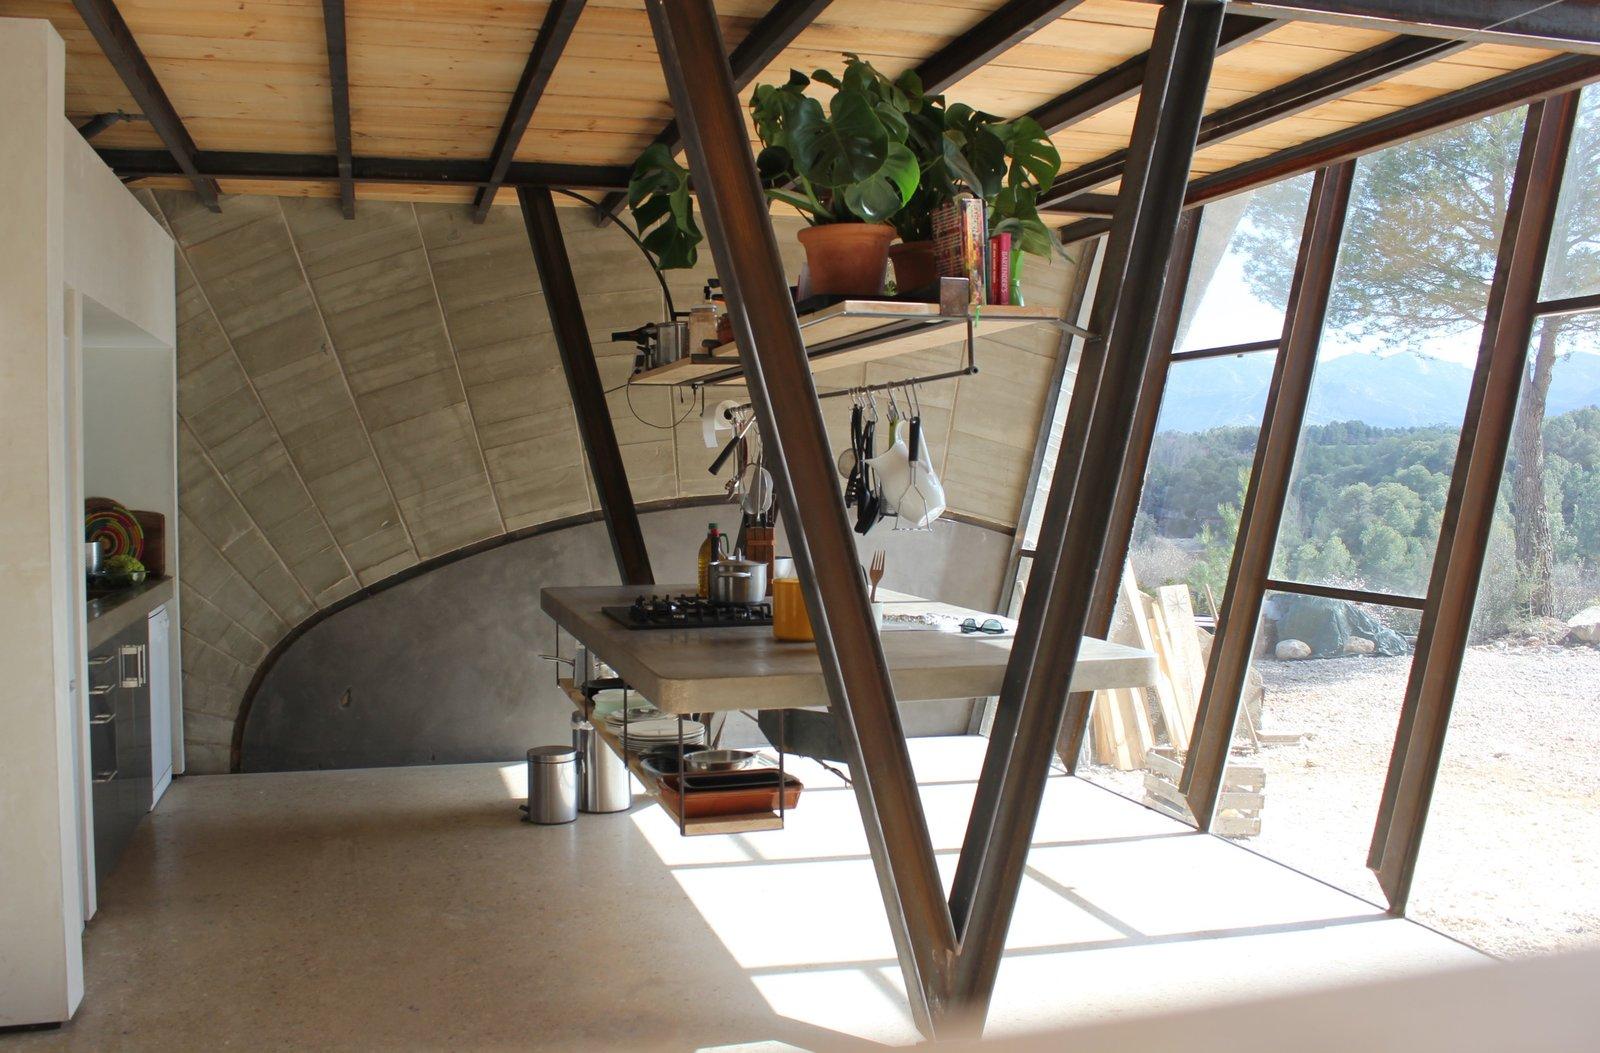 Kitchen, Concrete Counter, and Range  Super Cool Kitchen Islands by Erika Heet